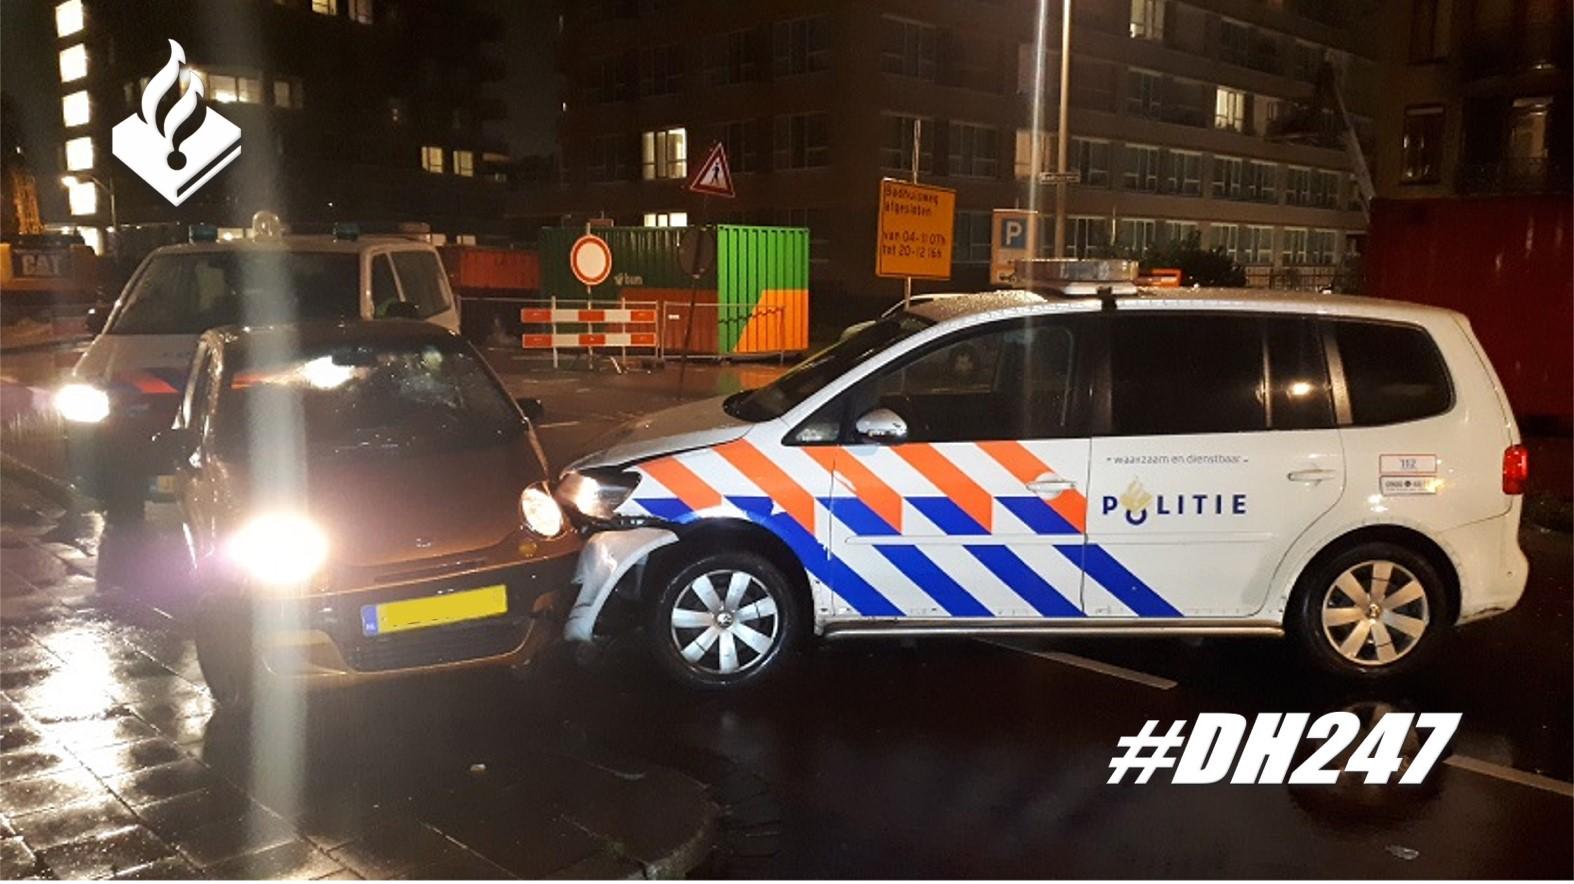 Automobilist rijdt in op politie in Scheveningen